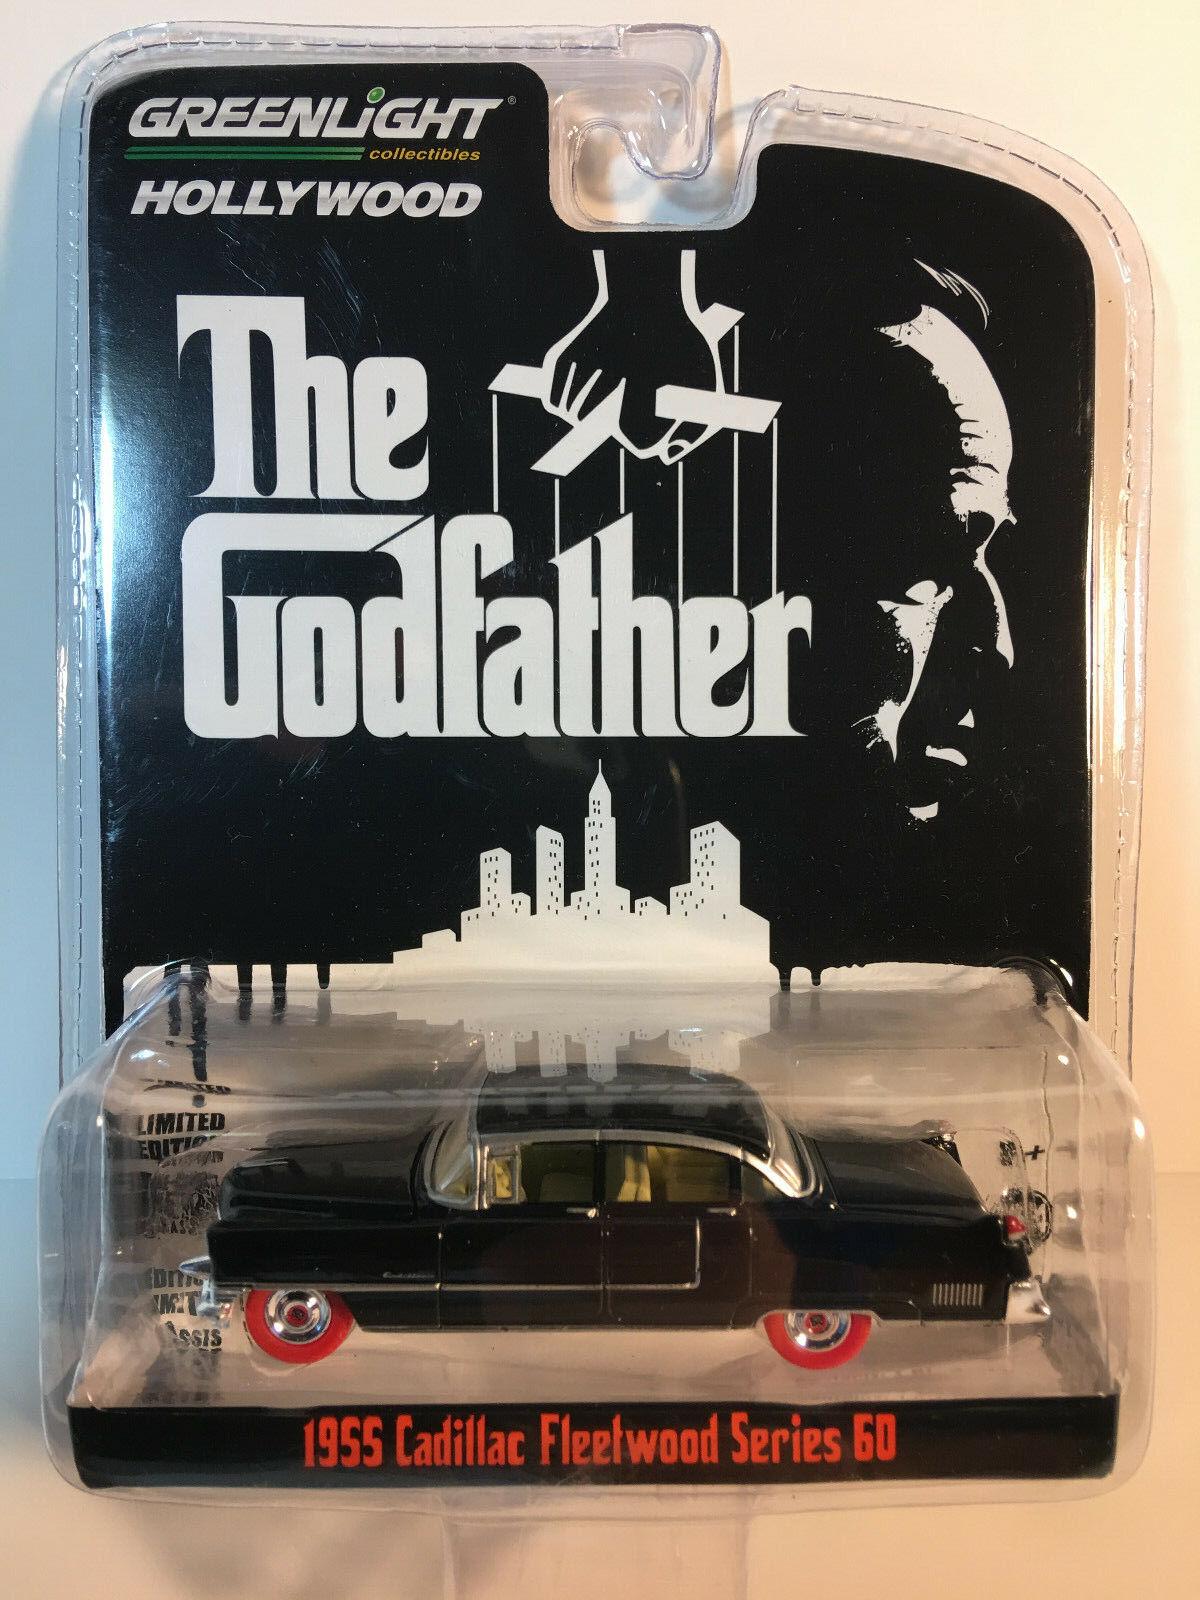 grönljus super Chase Hollyträ Godfather 1955 Cadillac Fleetträ röda däck